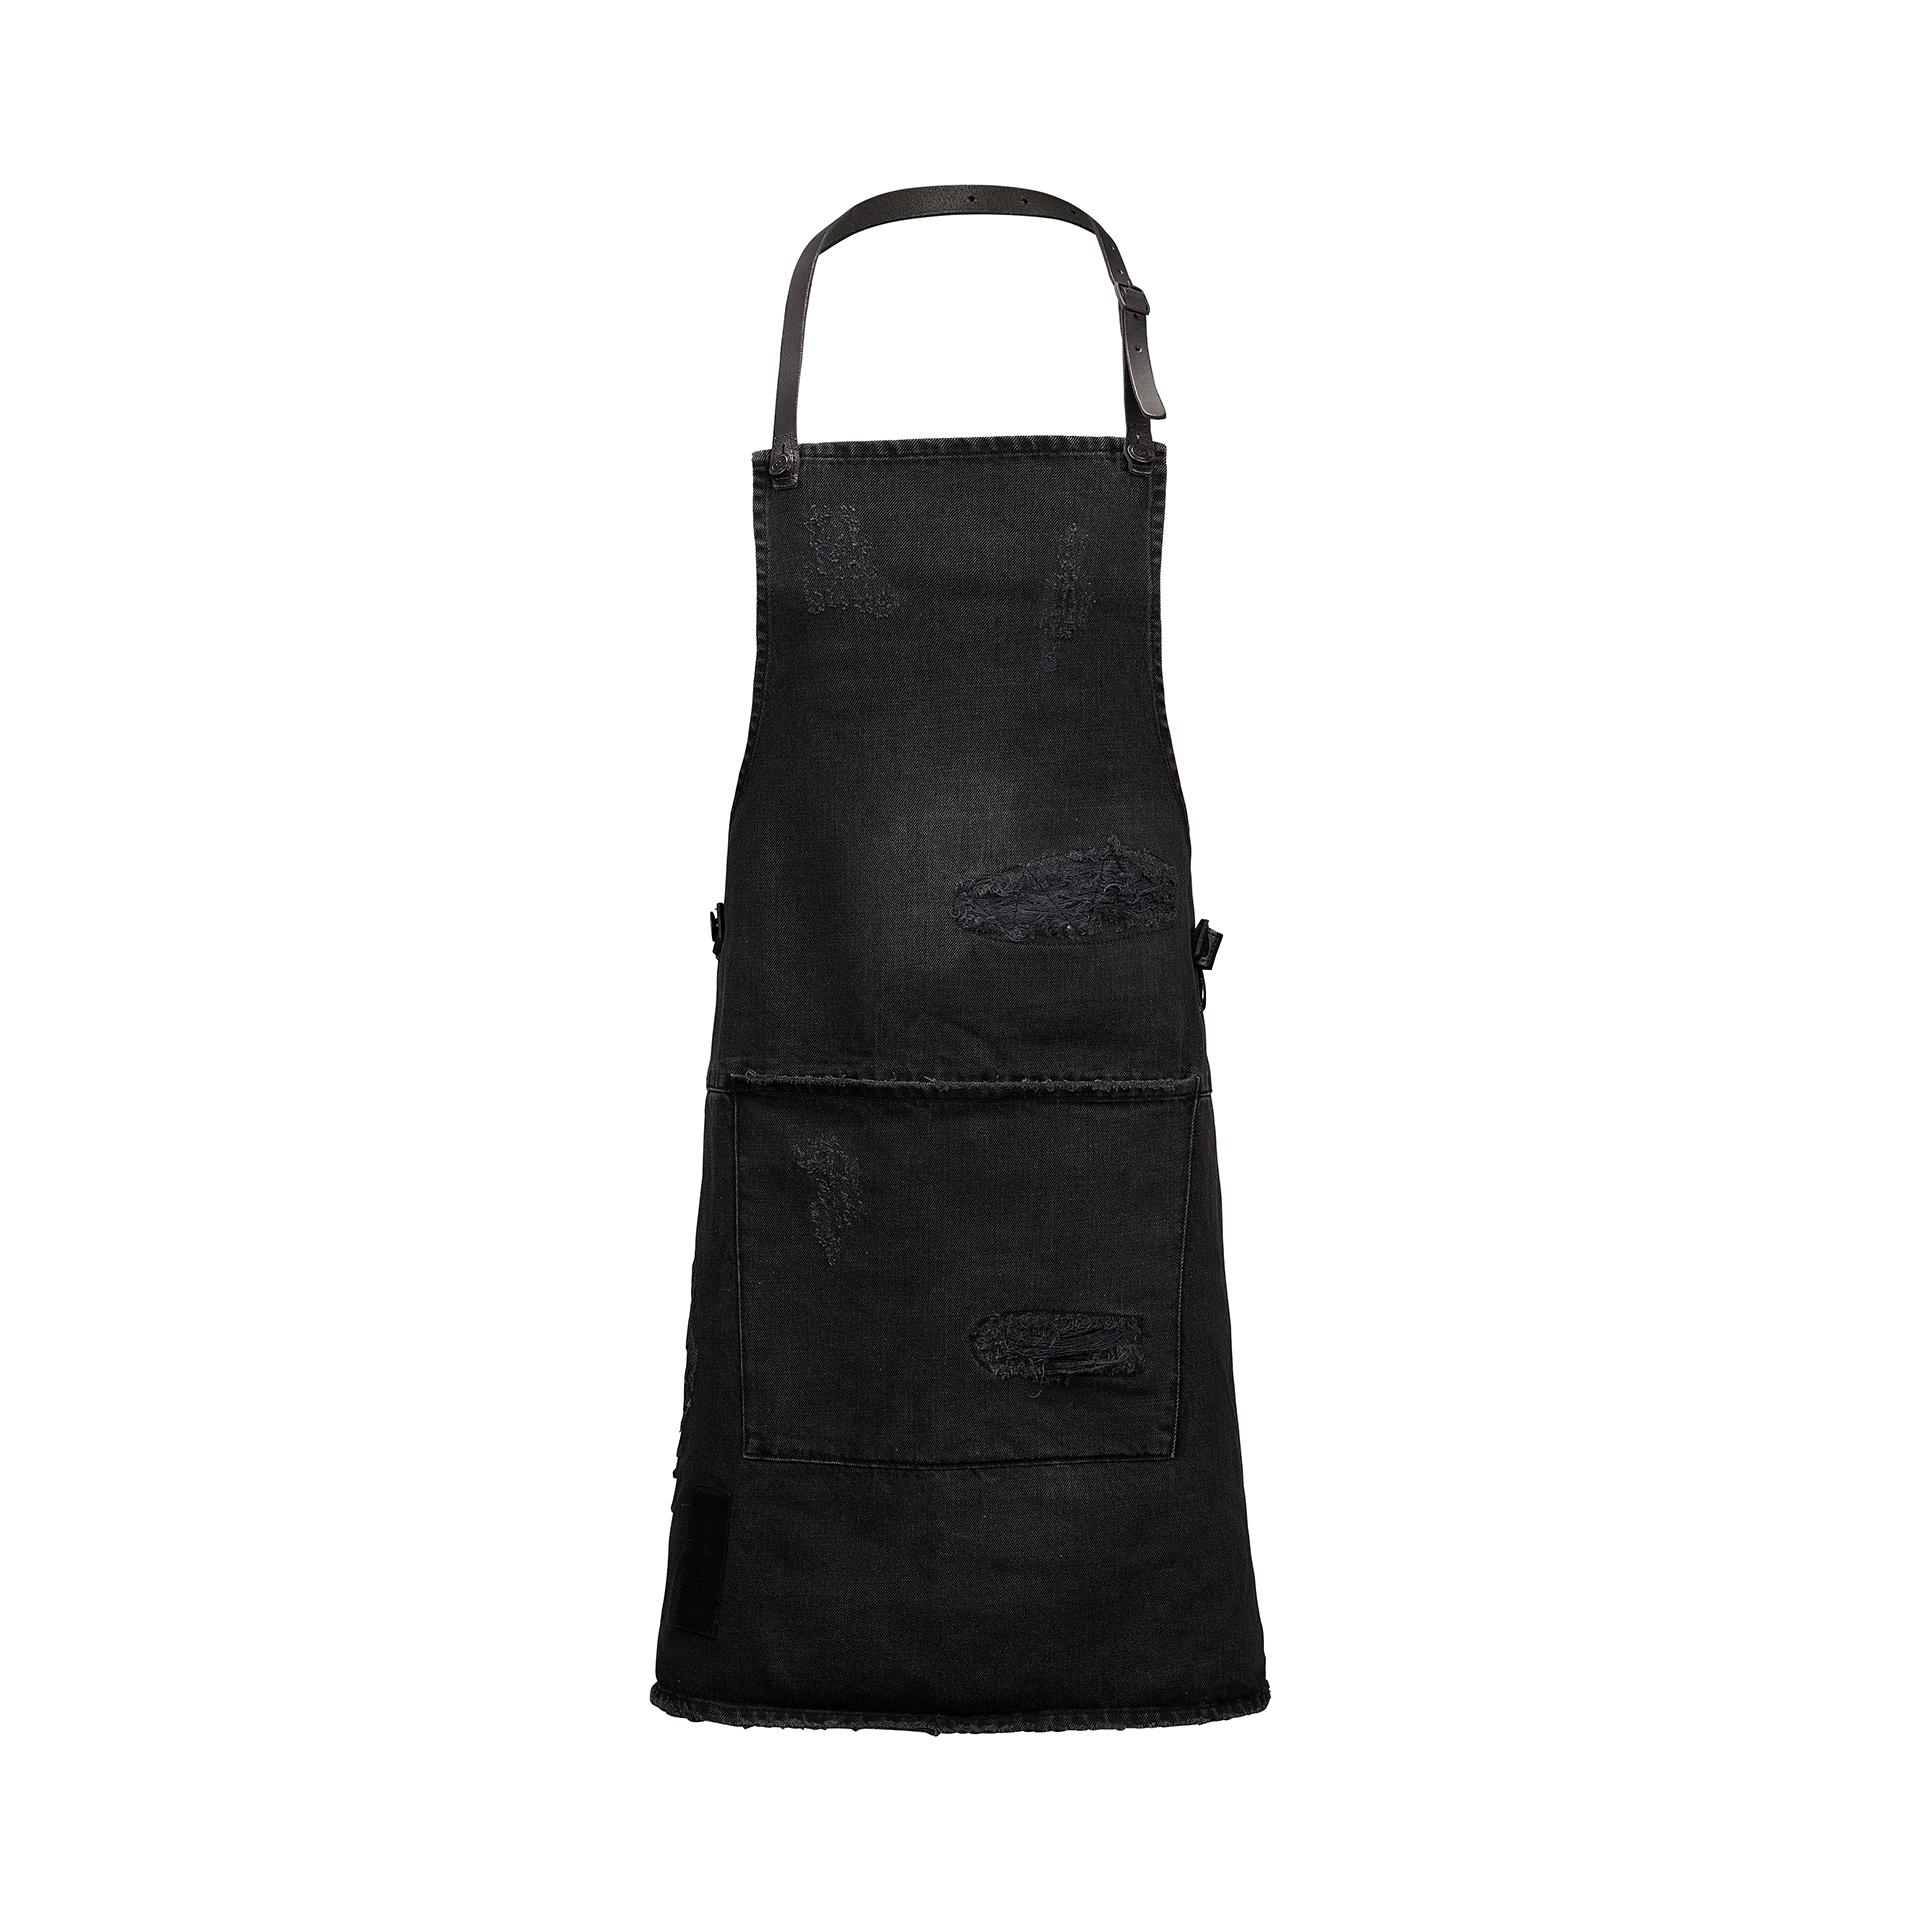 BBQ Style Apron